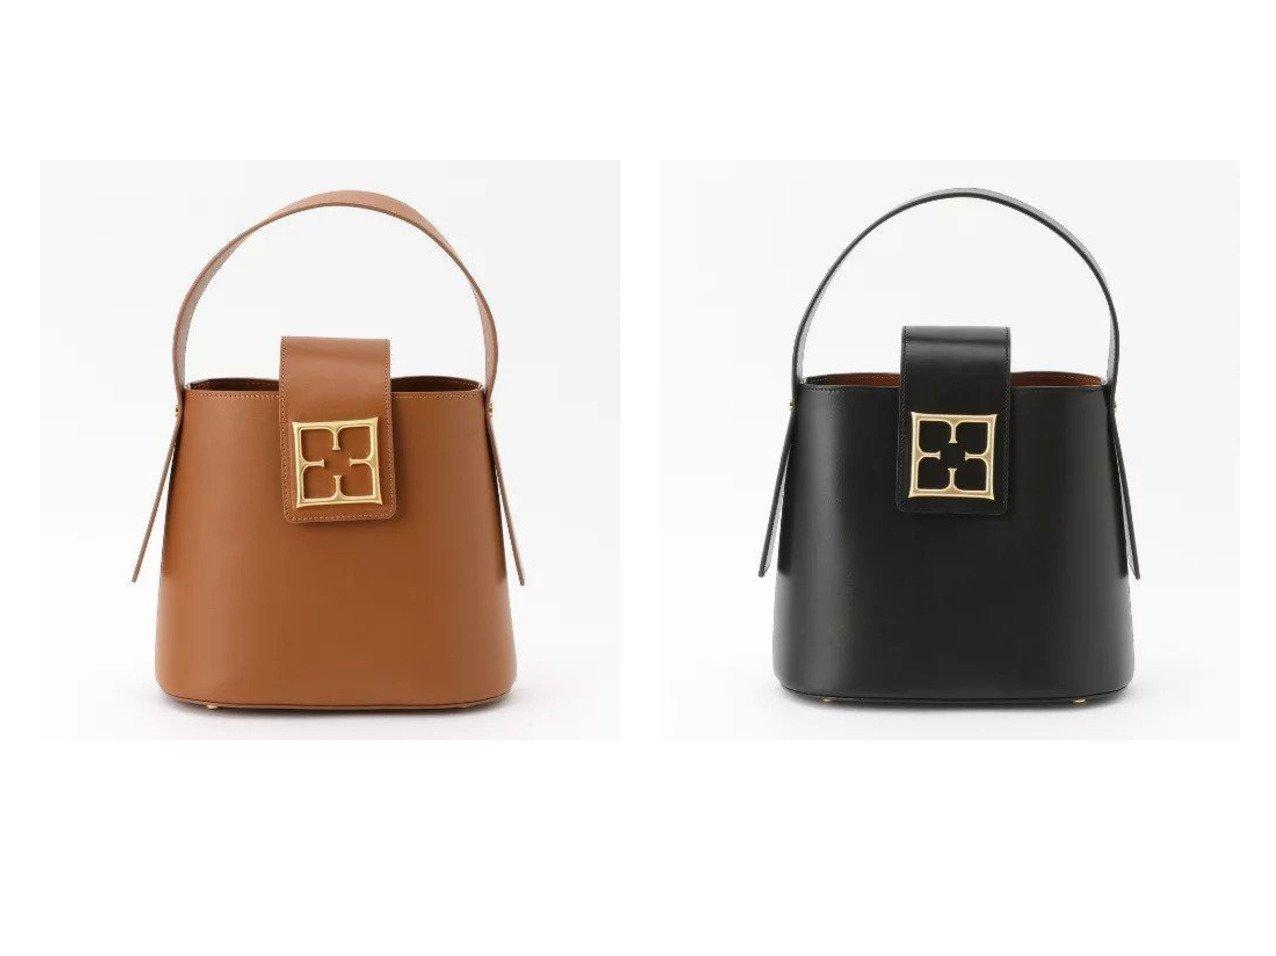 【EPOCA/エポカ】のロゴレザーワンハンドルバッグ 【バッグ・鞄】おすすめ!人気、トレンド・レディースファッションの通販 おすすめで人気の流行・トレンド、ファッションの通販商品 メンズファッション・キッズファッション・インテリア・家具・レディースファッション・服の通販 founy(ファニー) https://founy.com/ ファッション Fashion レディースファッション WOMEN バッグ Bag S/S・春夏 SS・Spring/Summer ショルダー シンプル チェーン ハンドバッグ バケツ フォルム モチーフ 春 Spring  ID:crp329100000032410